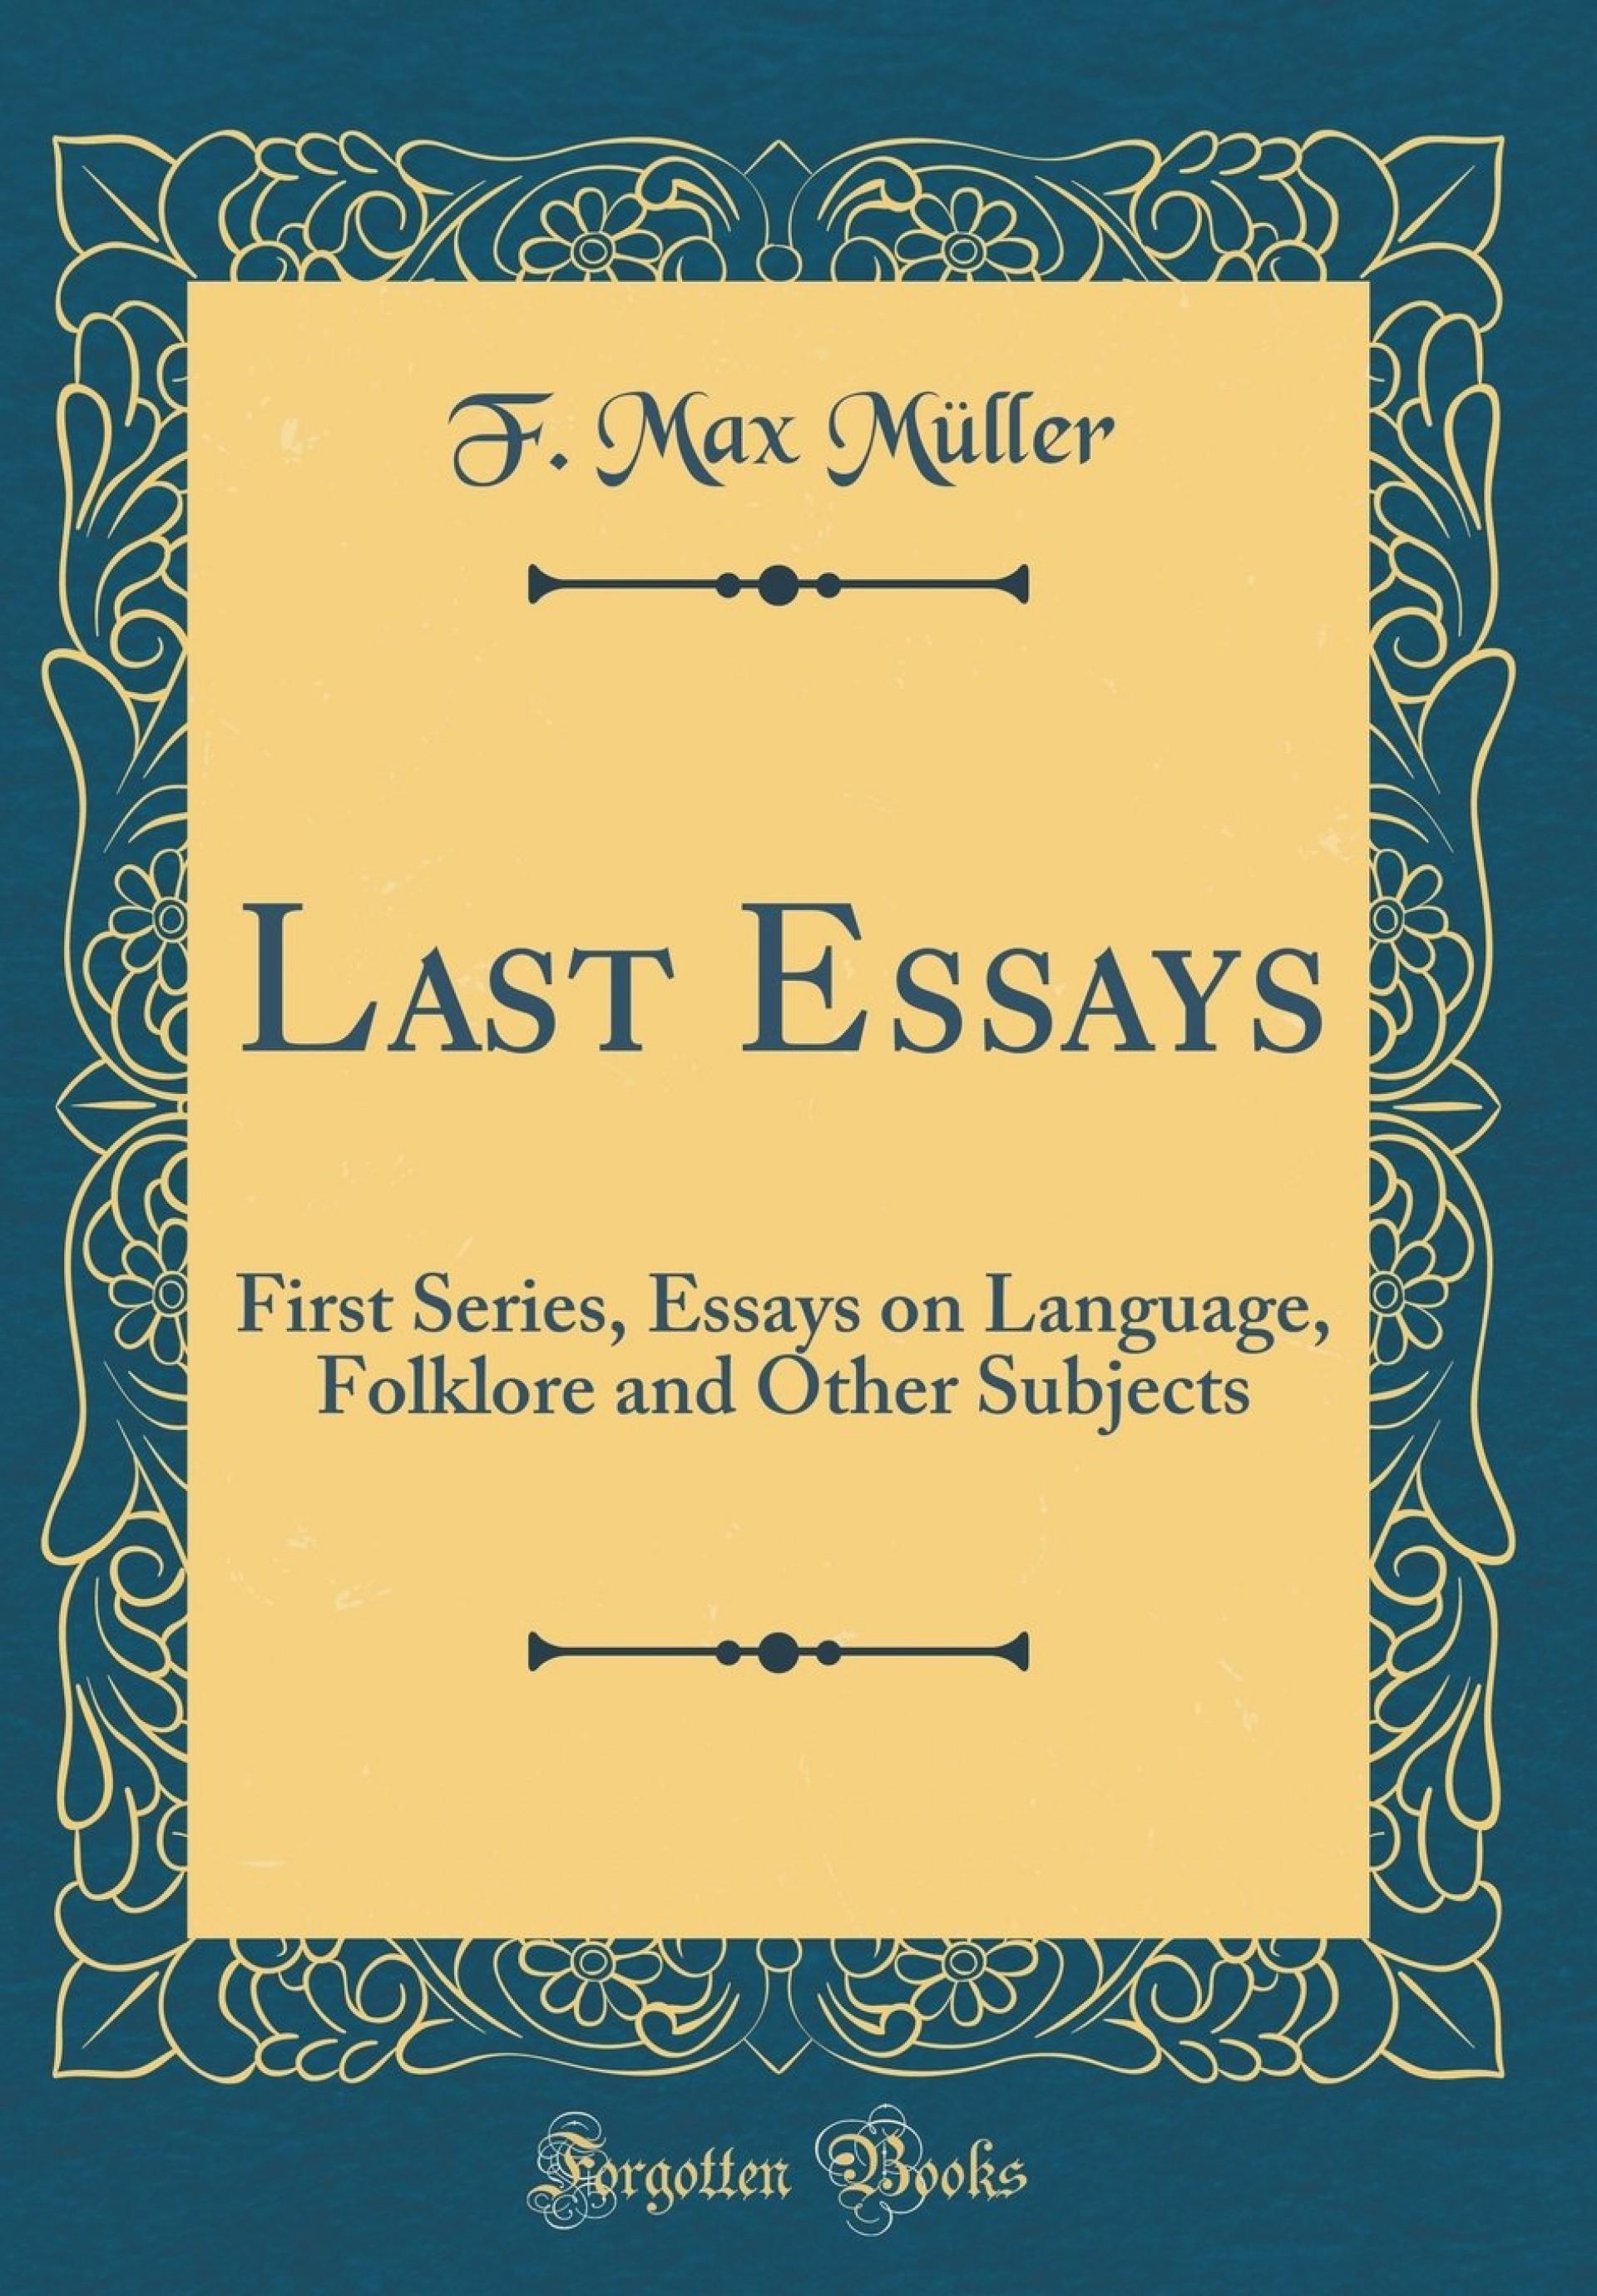 016 712b4xpd8bkl Essays First Series Essay Stunning In Zen Buddhism Emerson's Value 1920